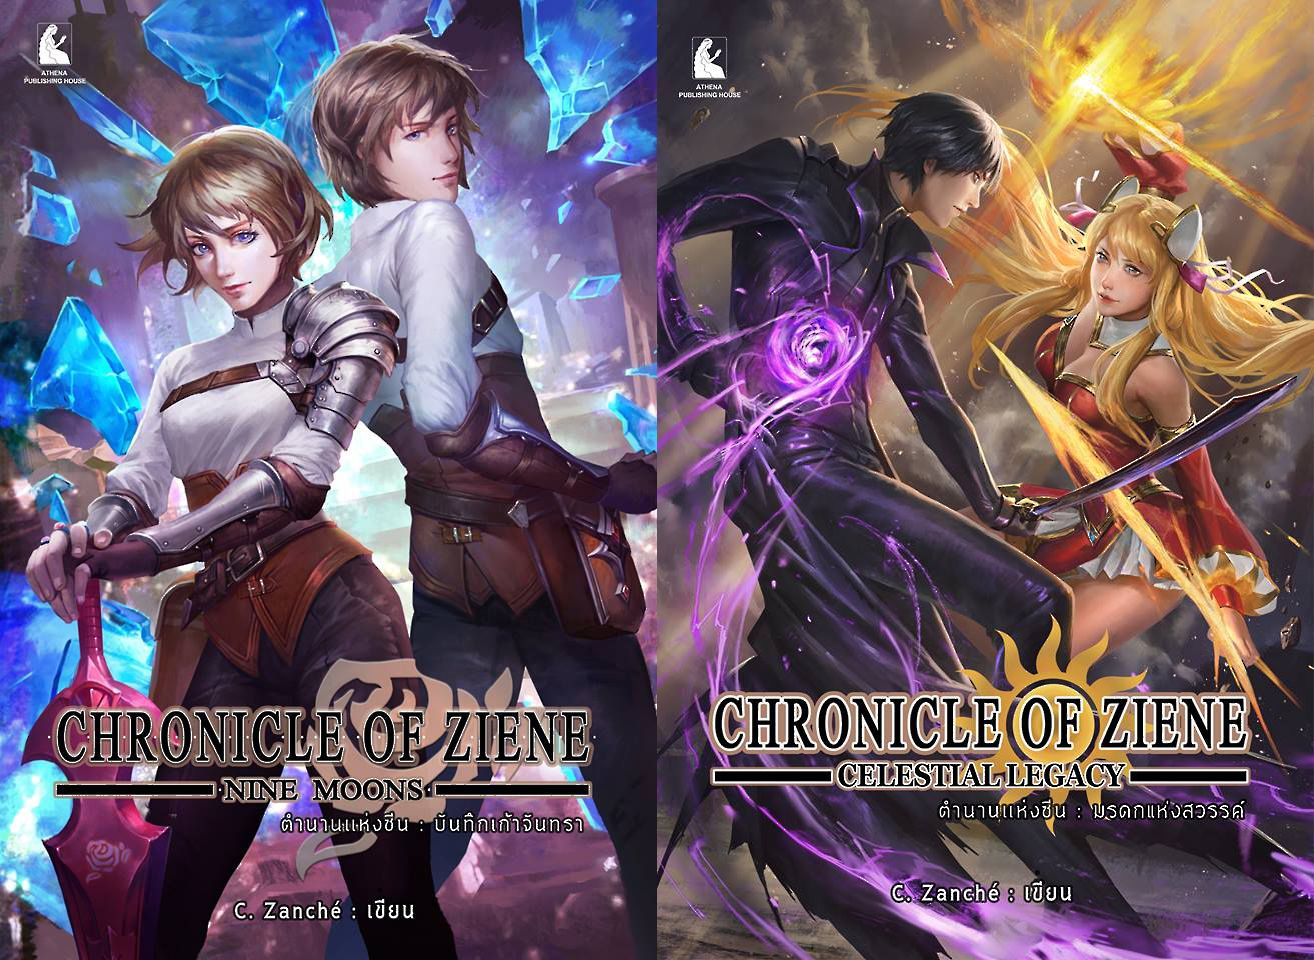 Chronicle of Ziene ทั้งสองเล่ม และกำลังจะมีเล่มที่สามครับ หาซื้อได้ตามร้านหนังสือชั้นนำทั่วไปครับ